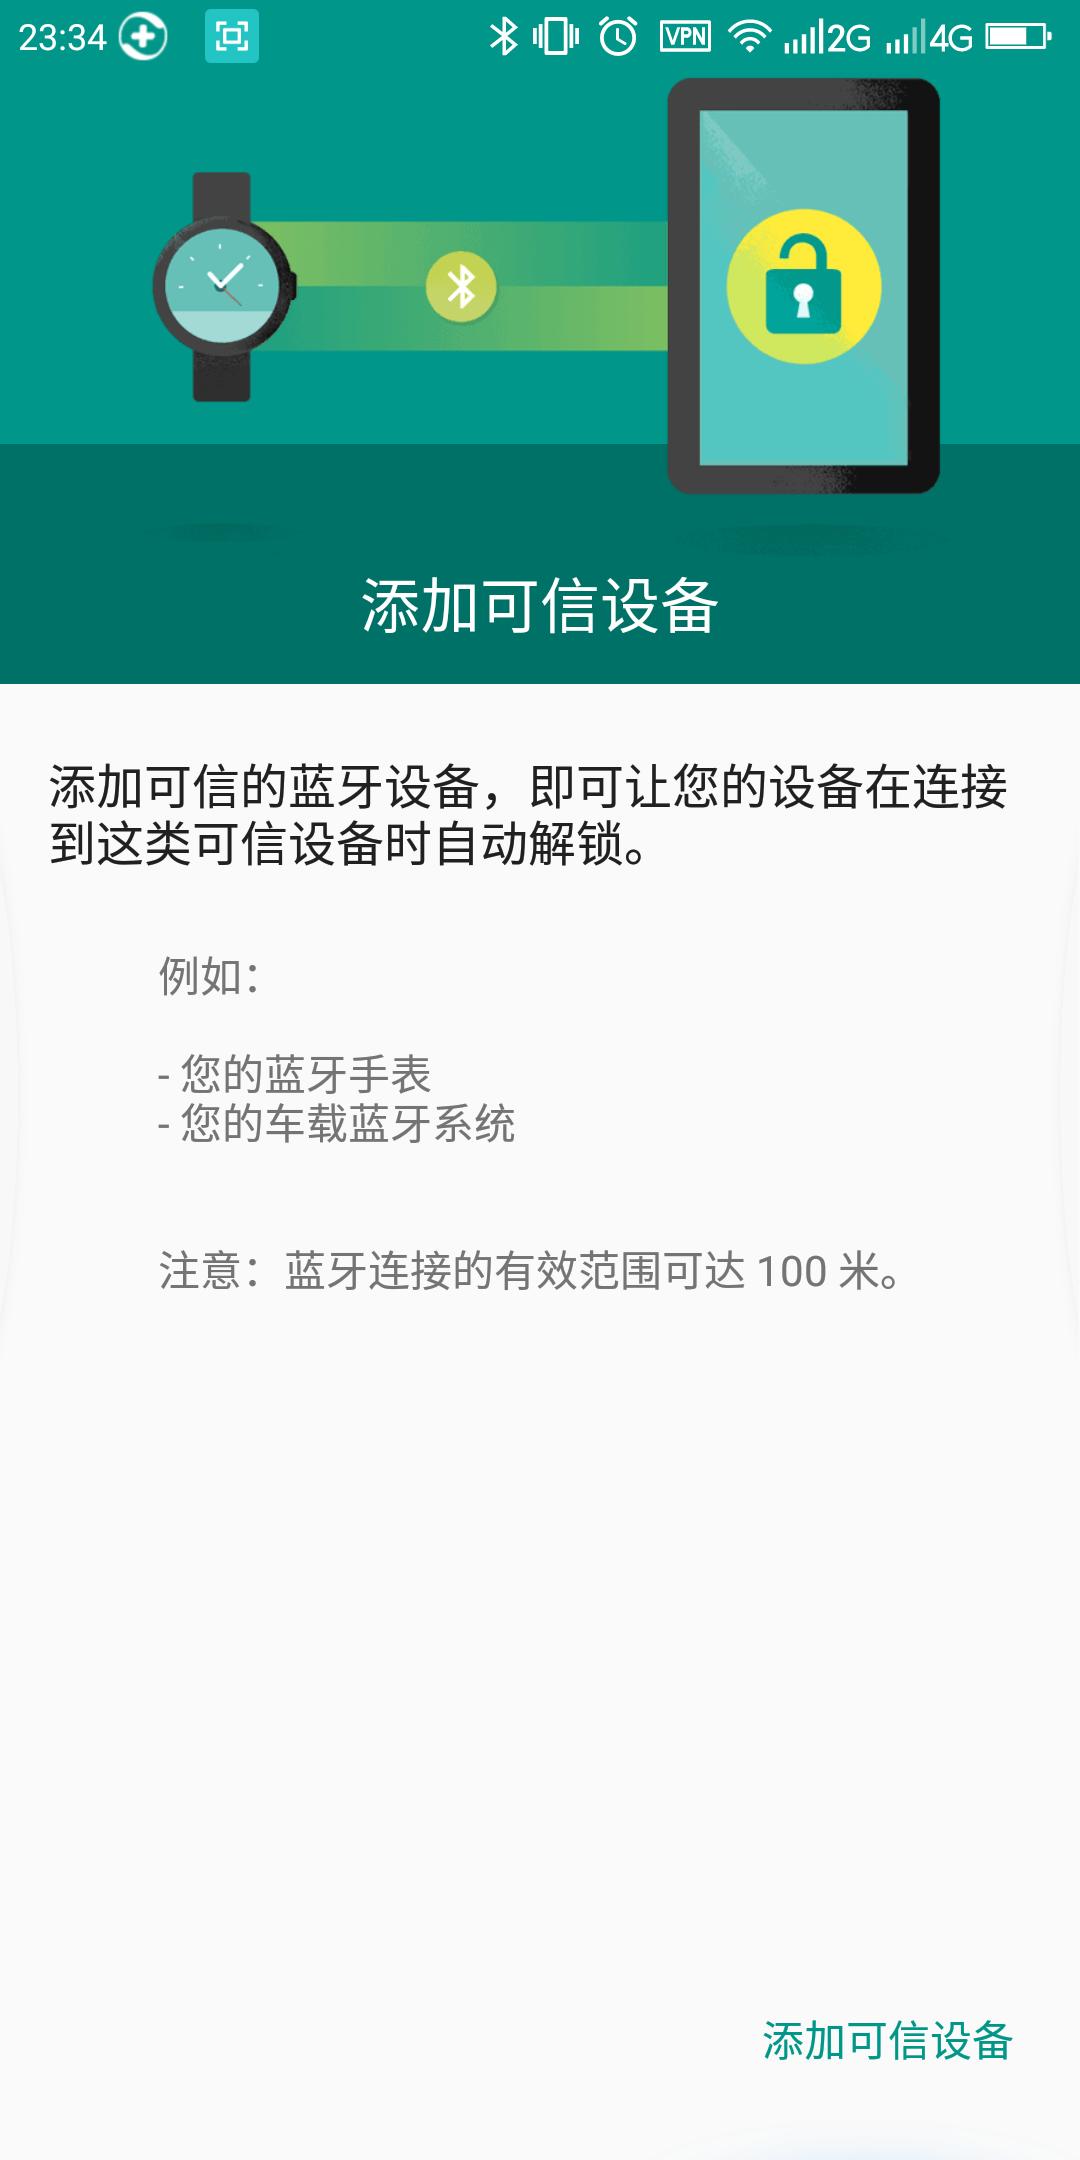 Screenshot_2018-12-27-23-34-17.png